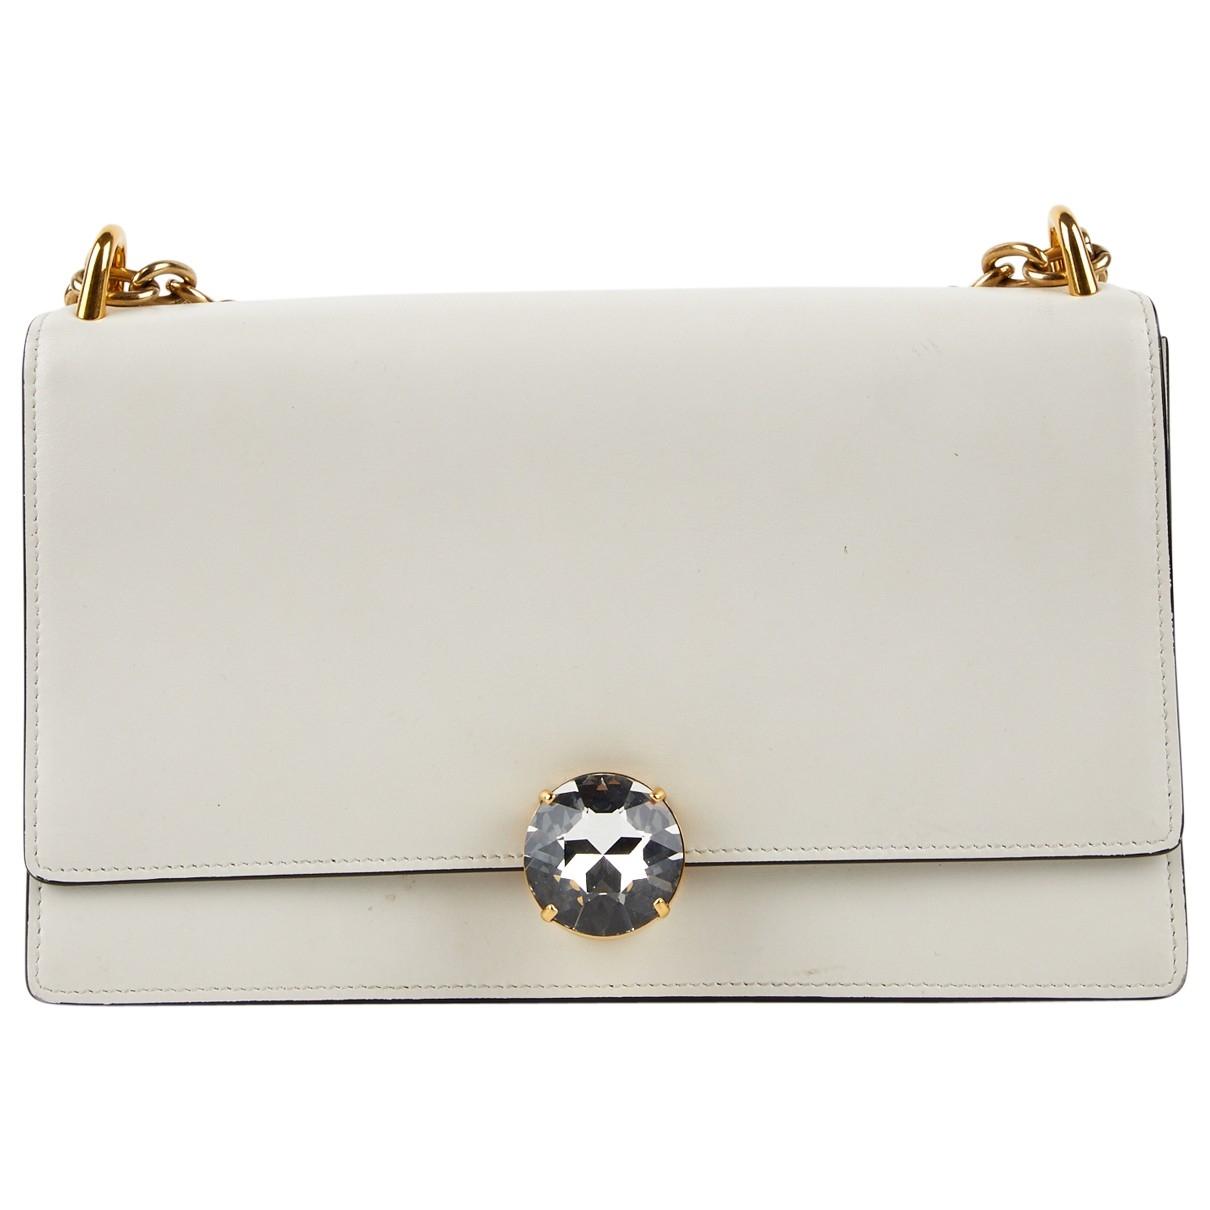 Miu Miu Miu Miu Club Ecru Leather handbag for Women \N